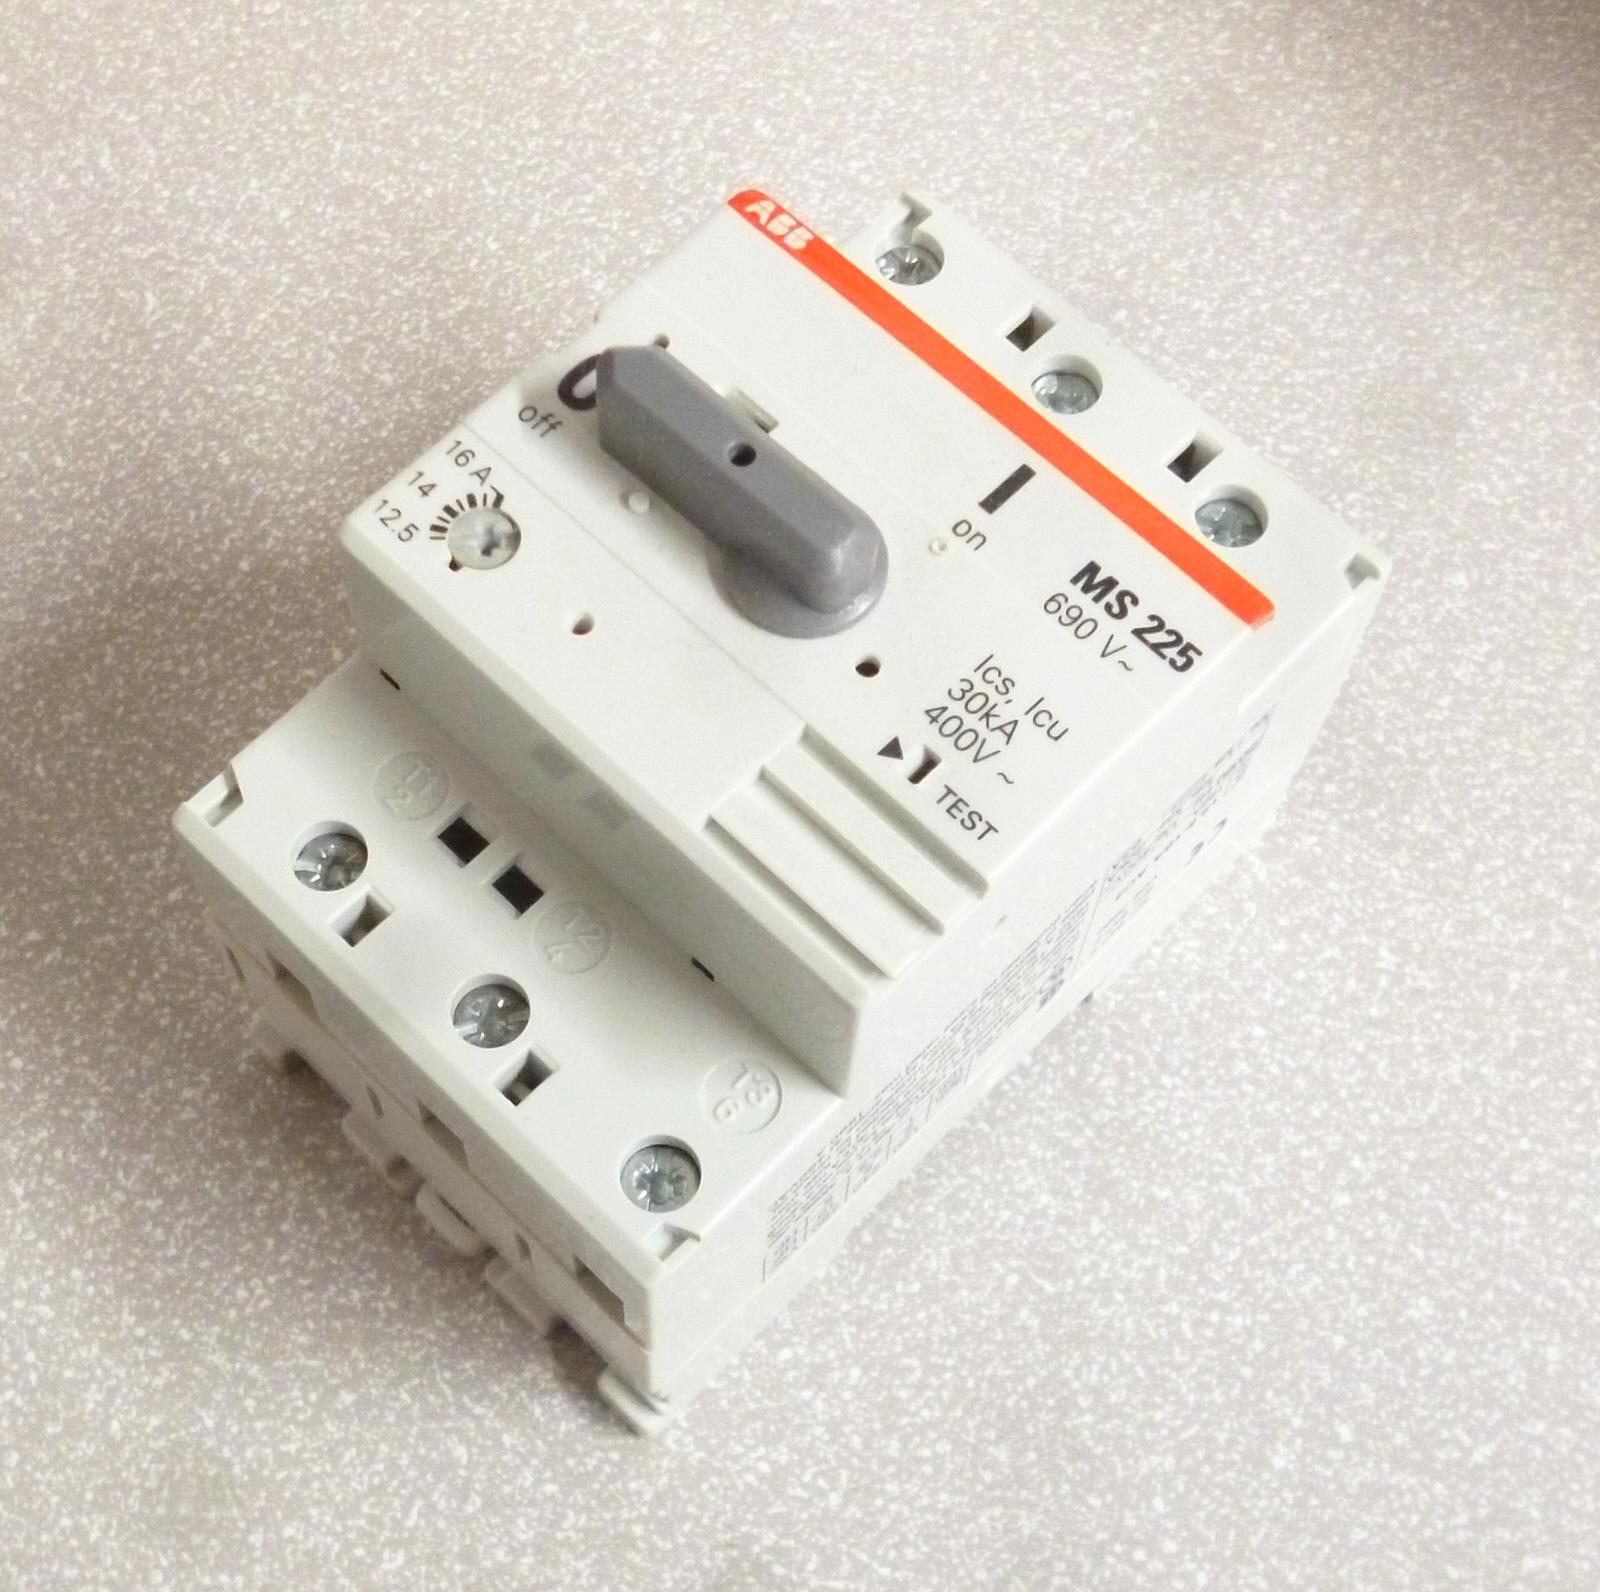 Abb Capacitors Ltd 28 Images Capacitor Repair Power Factor Services Ltd Abb Distribution